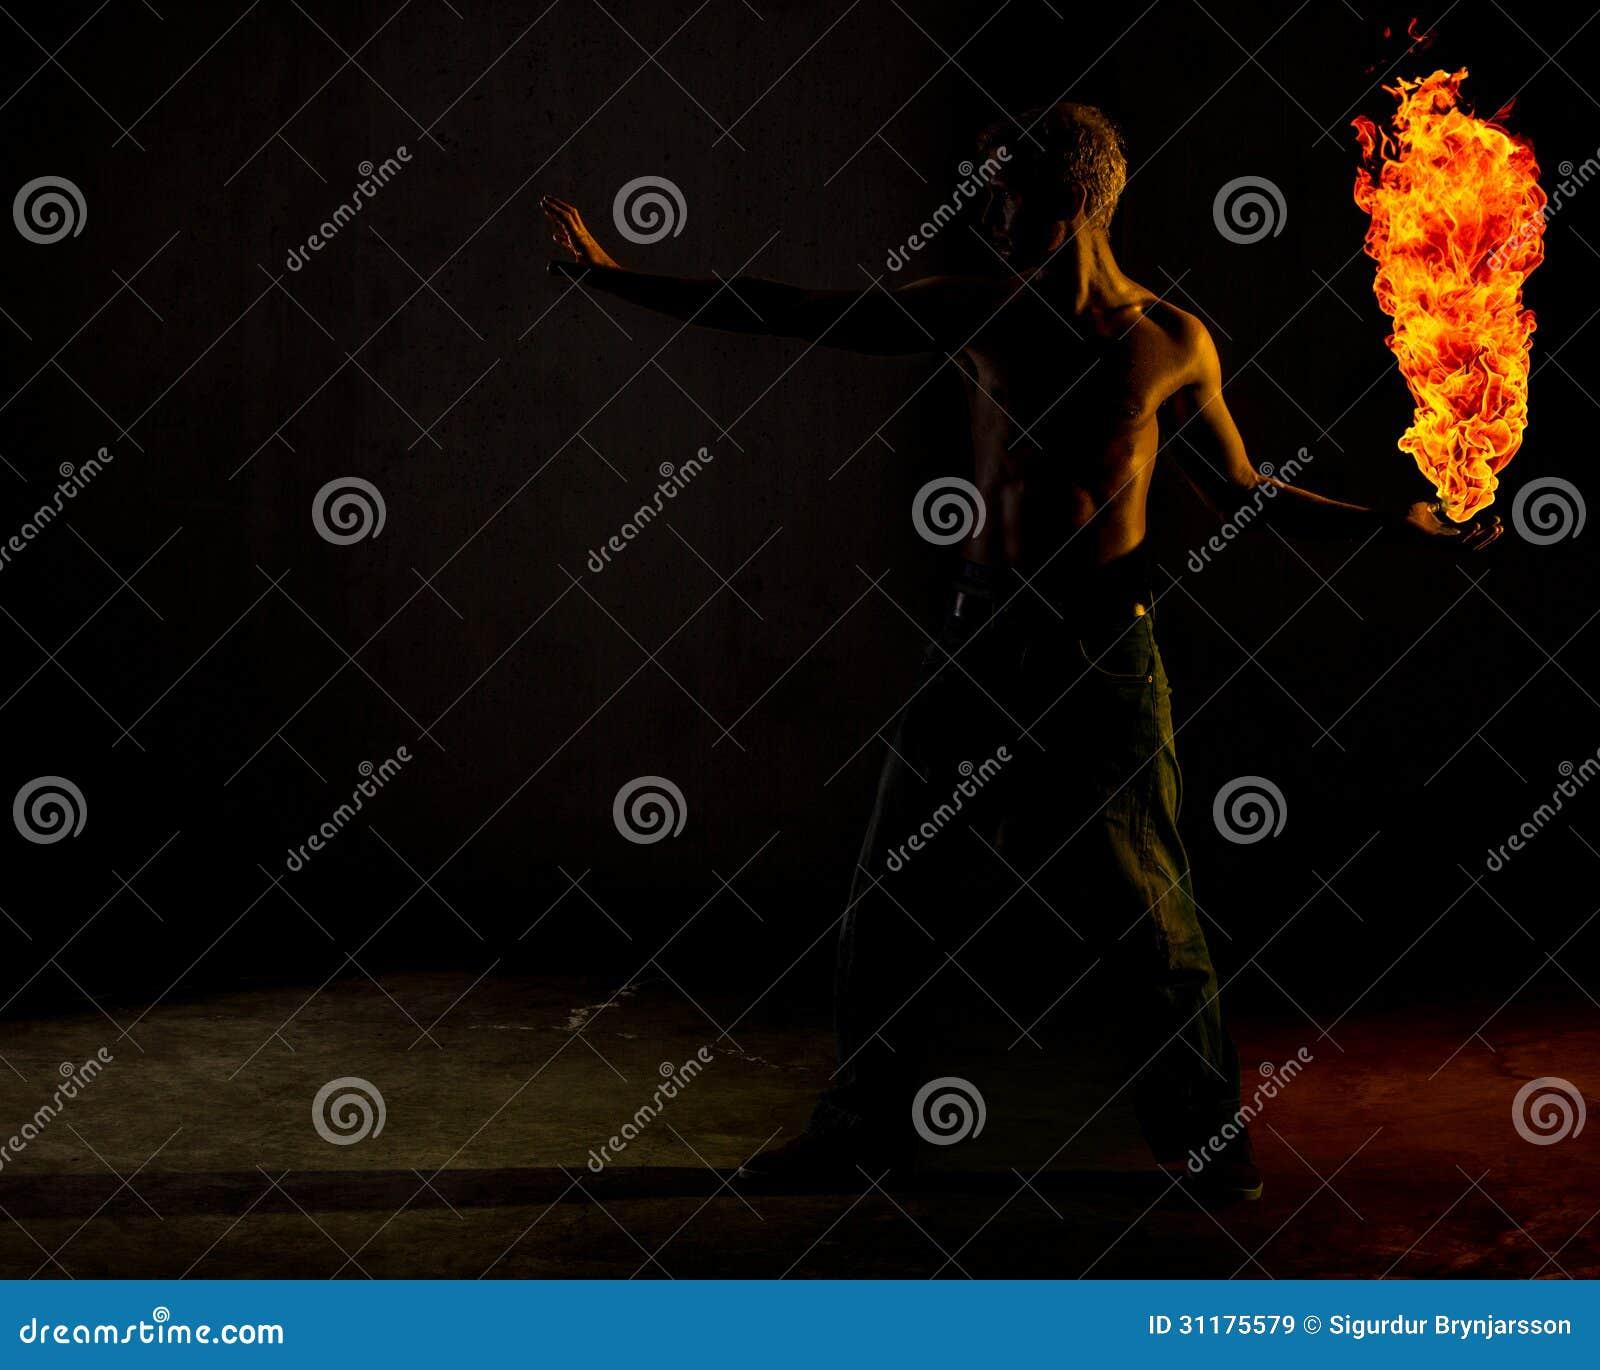 A man holding a ball of fire